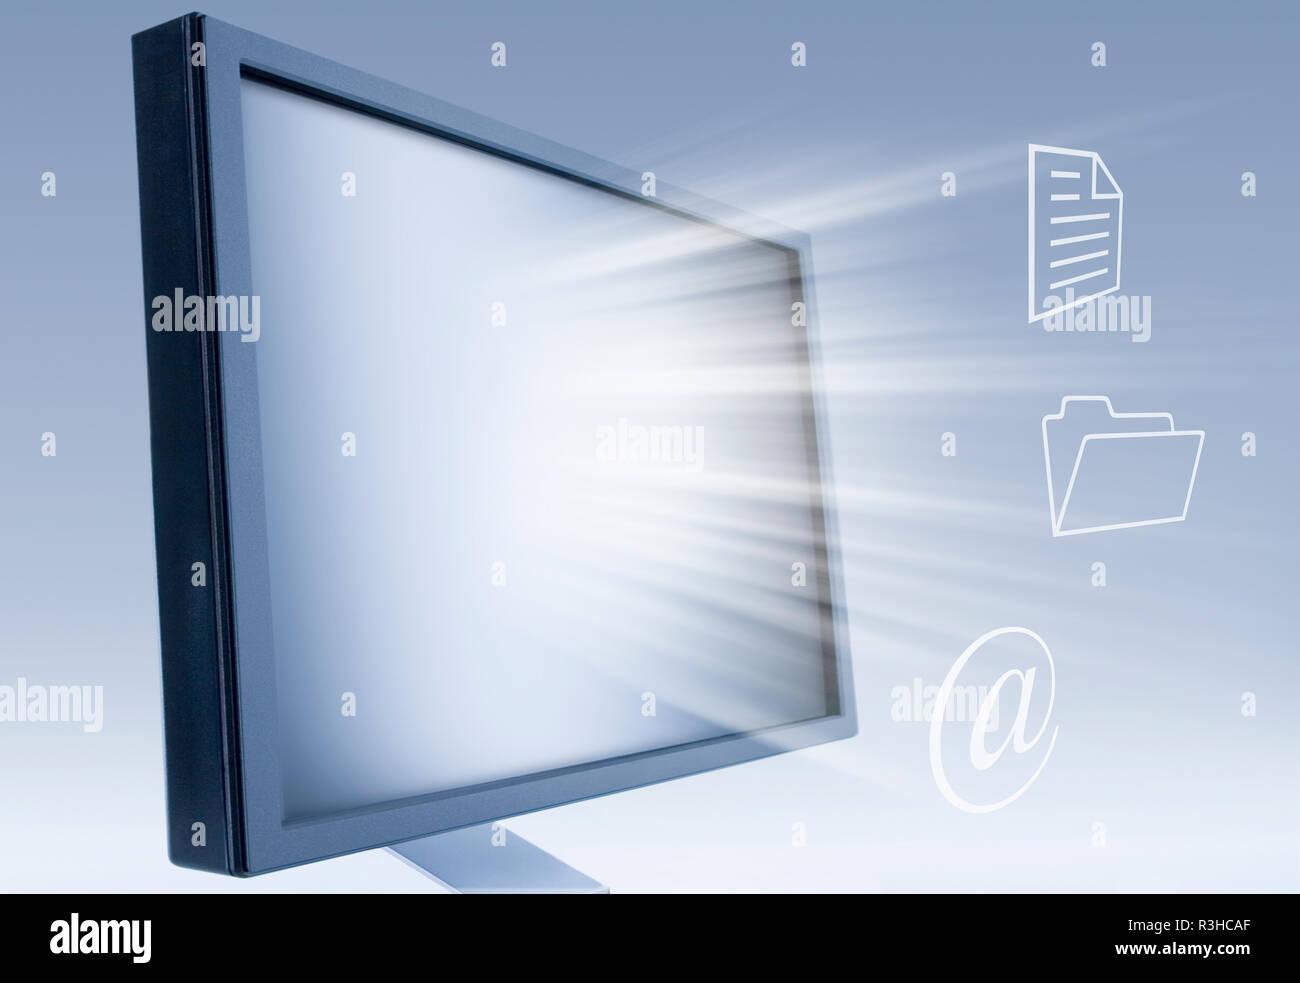 computer workstation - Stock Image